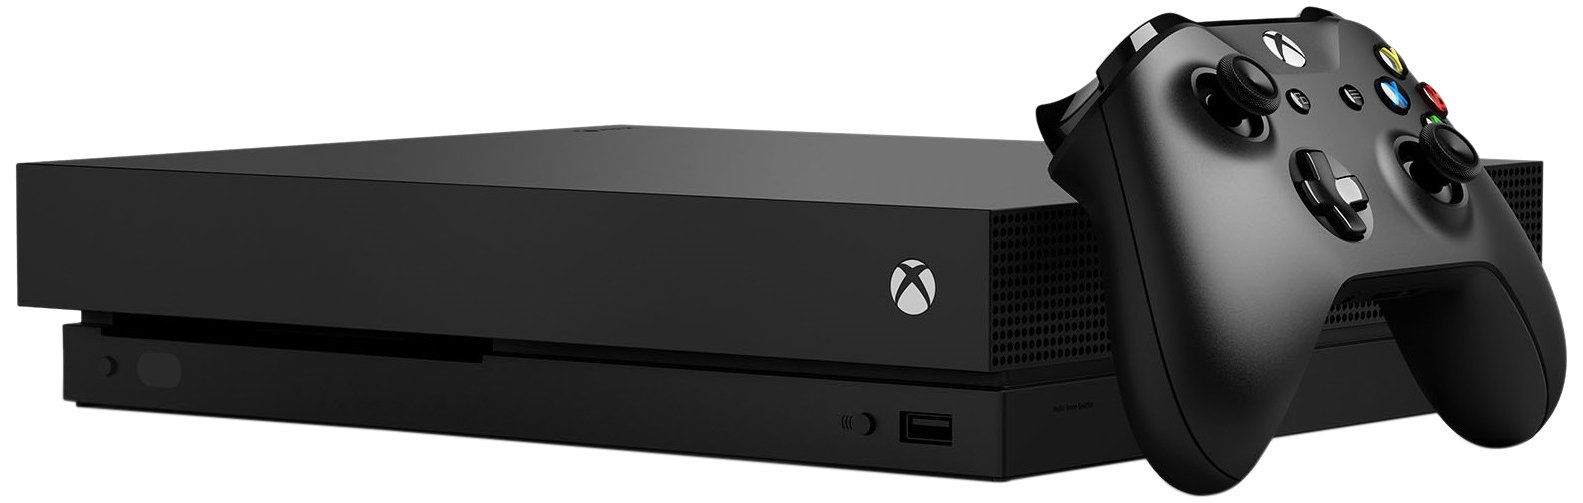 【29%OFF】Xbox One X